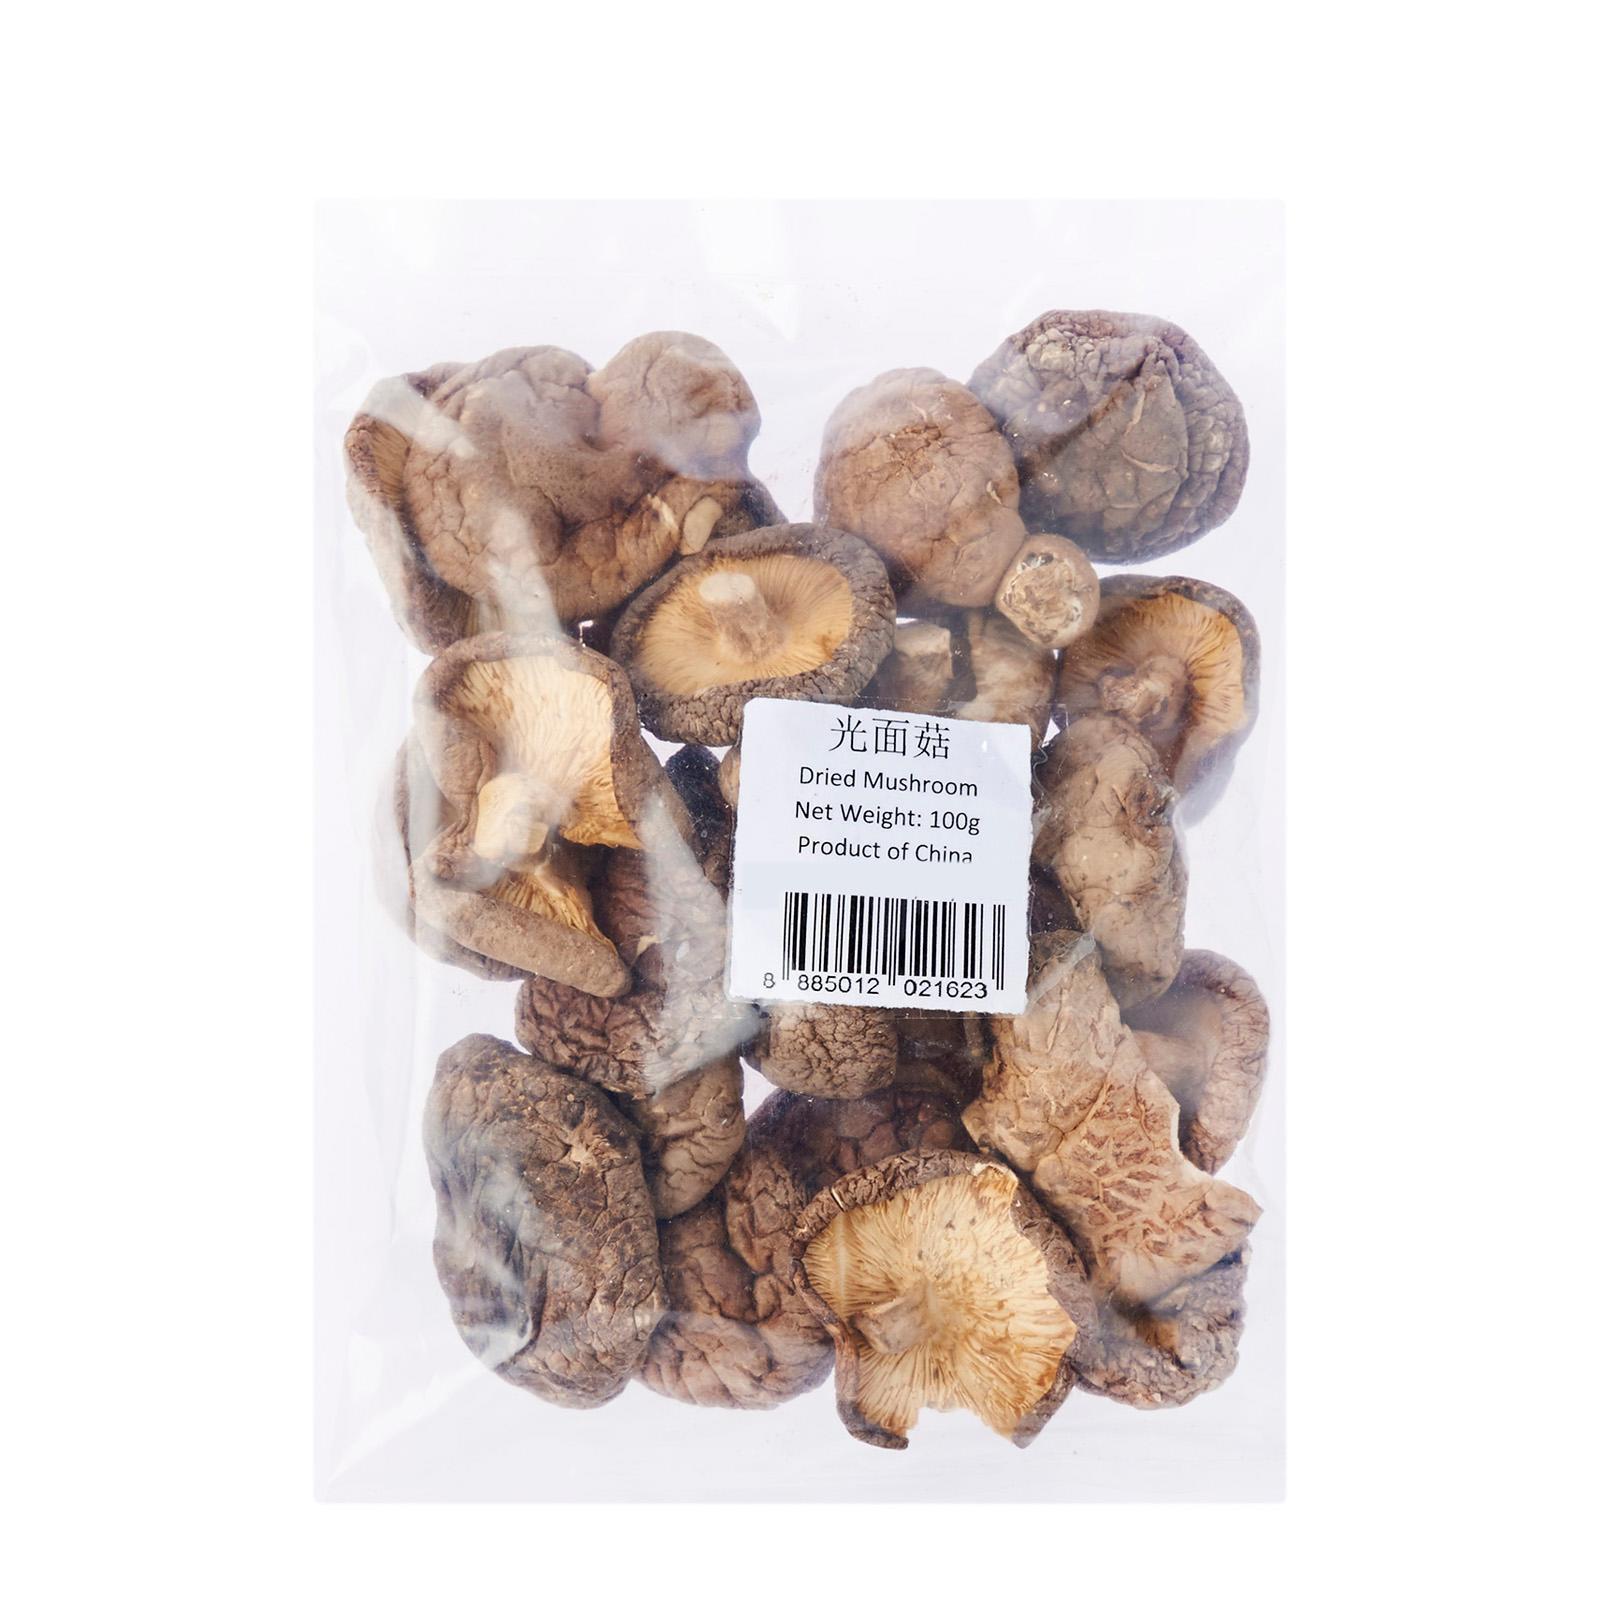 Premium Dried Mushroom